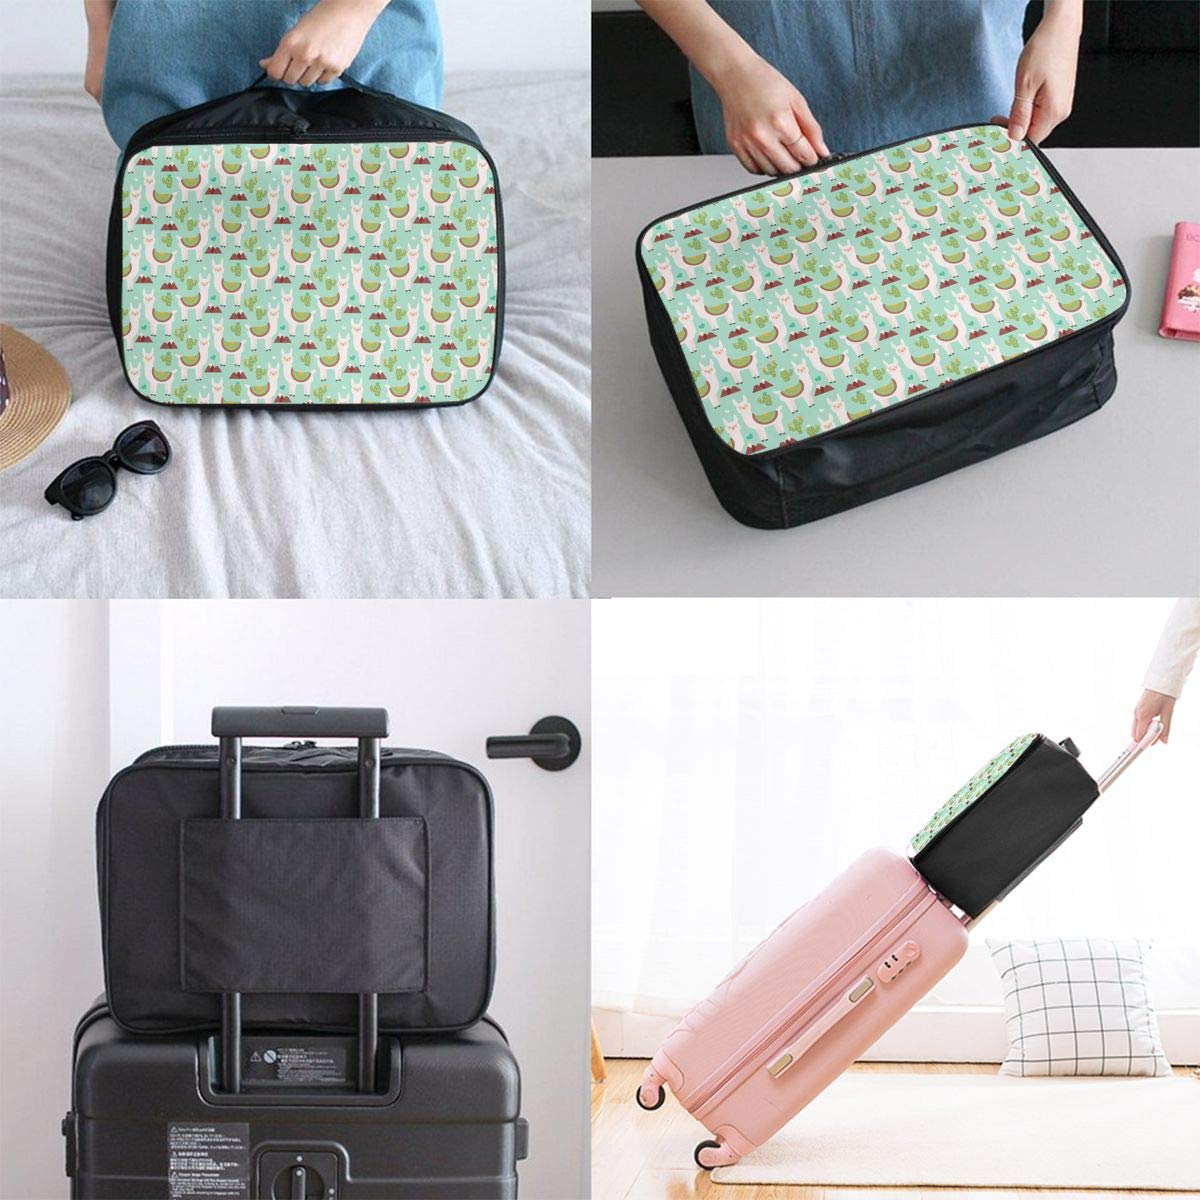 Travel Bag Llama Cactus Waterproof Large Capacity Portable Luggage Bag